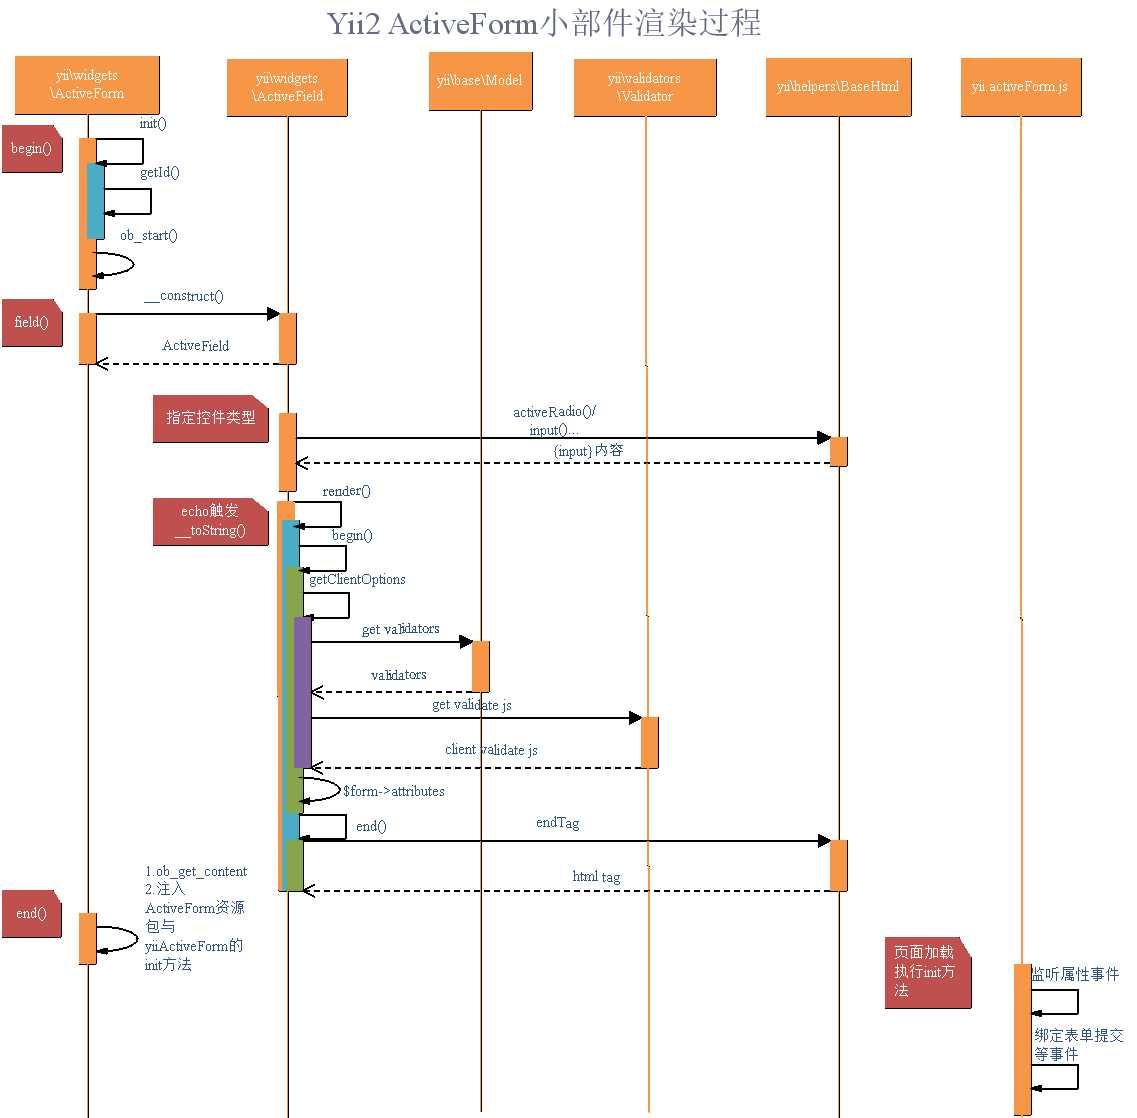 Yii2 ActiveForm小部件渲染過程- IT閱讀